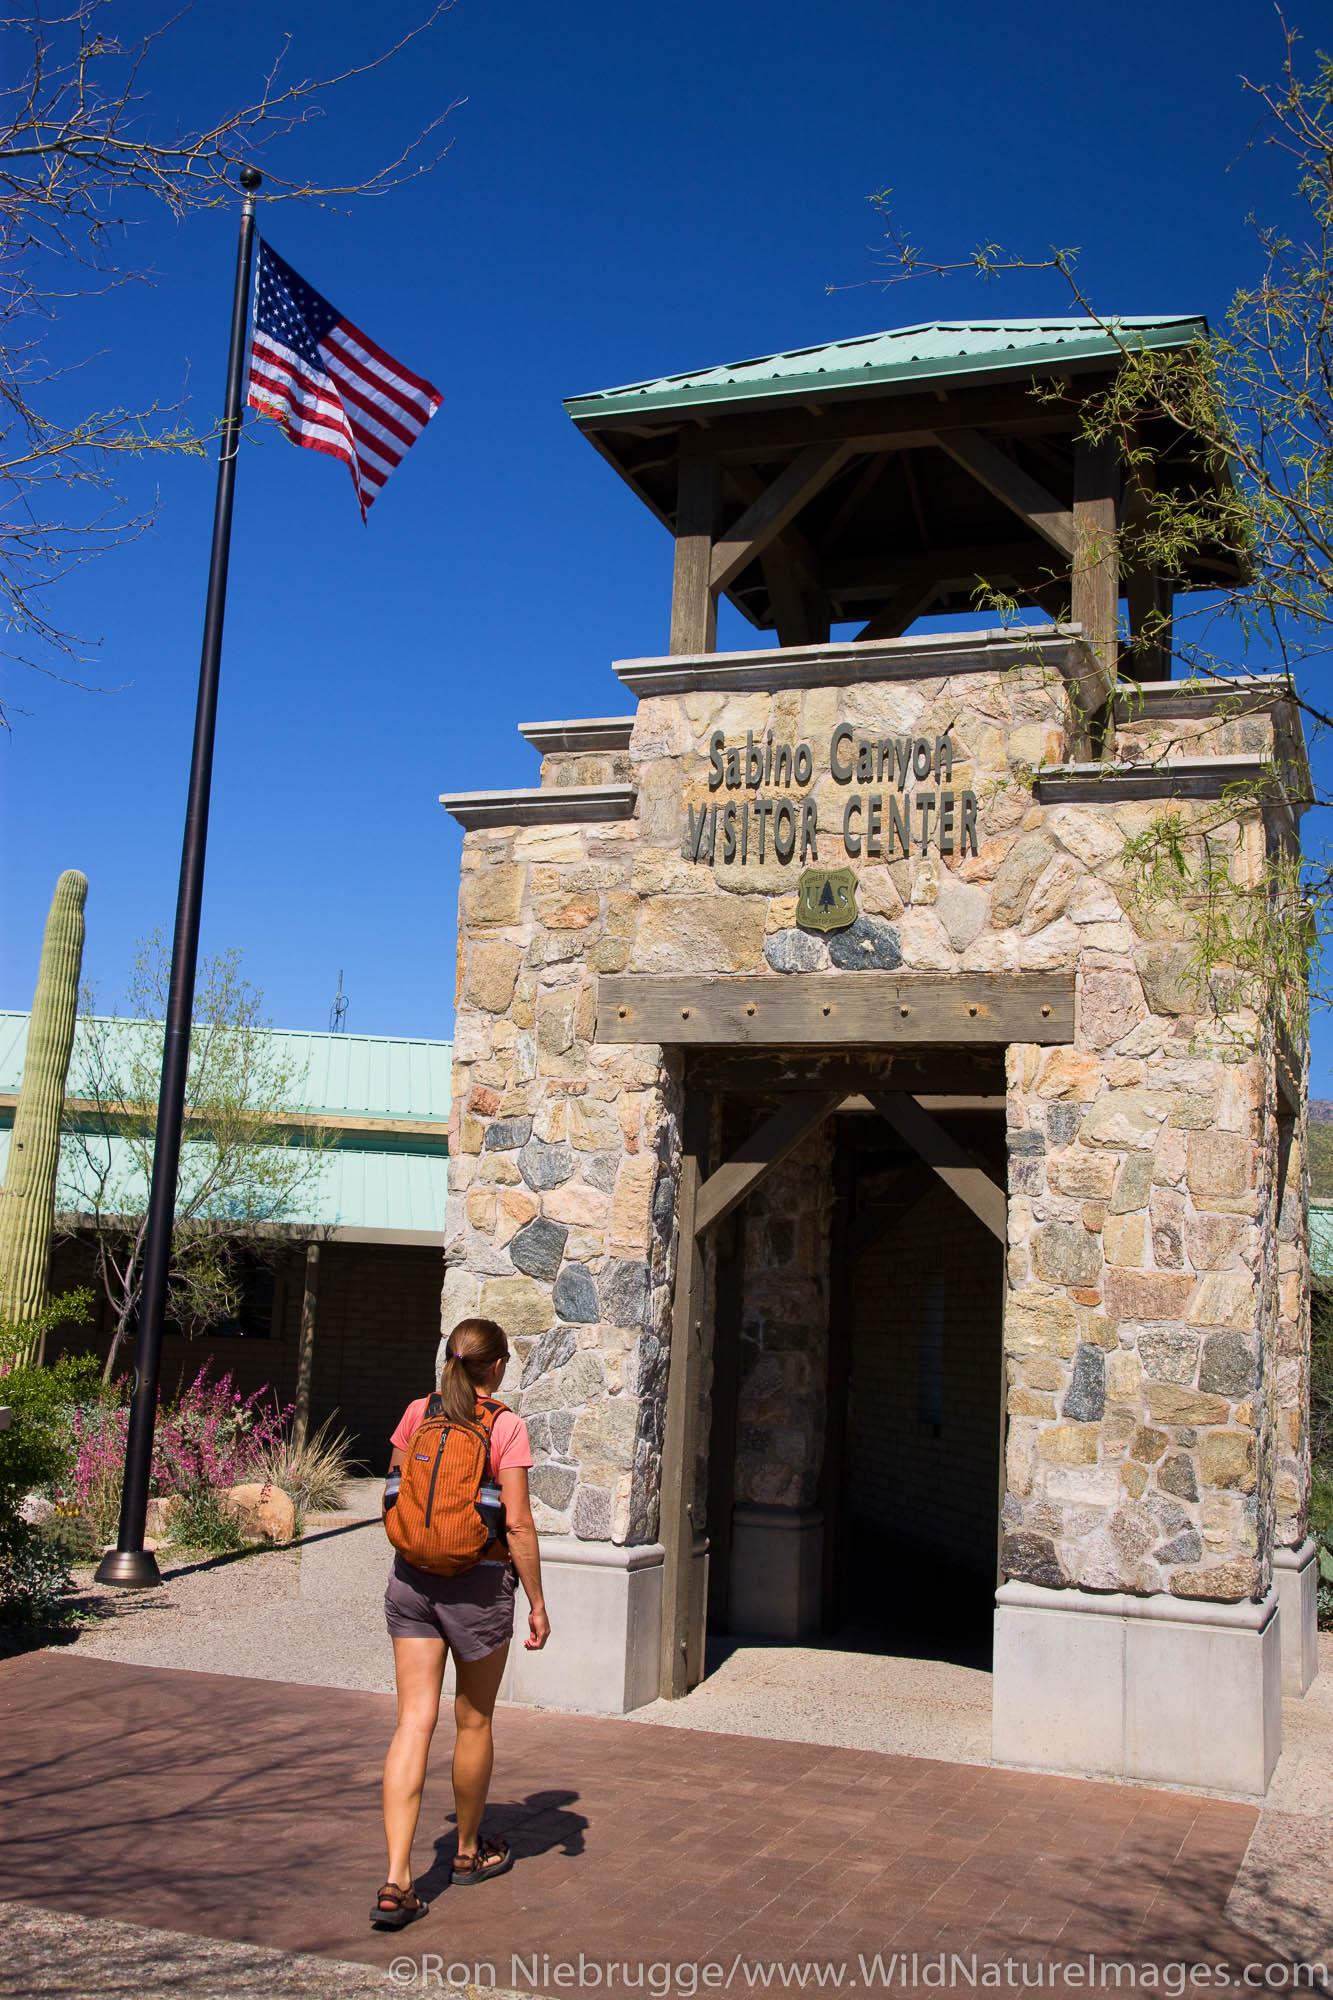 Visitor Center, Sabino Canyon Recreation Area, Tucson, Arizona.  (model released)